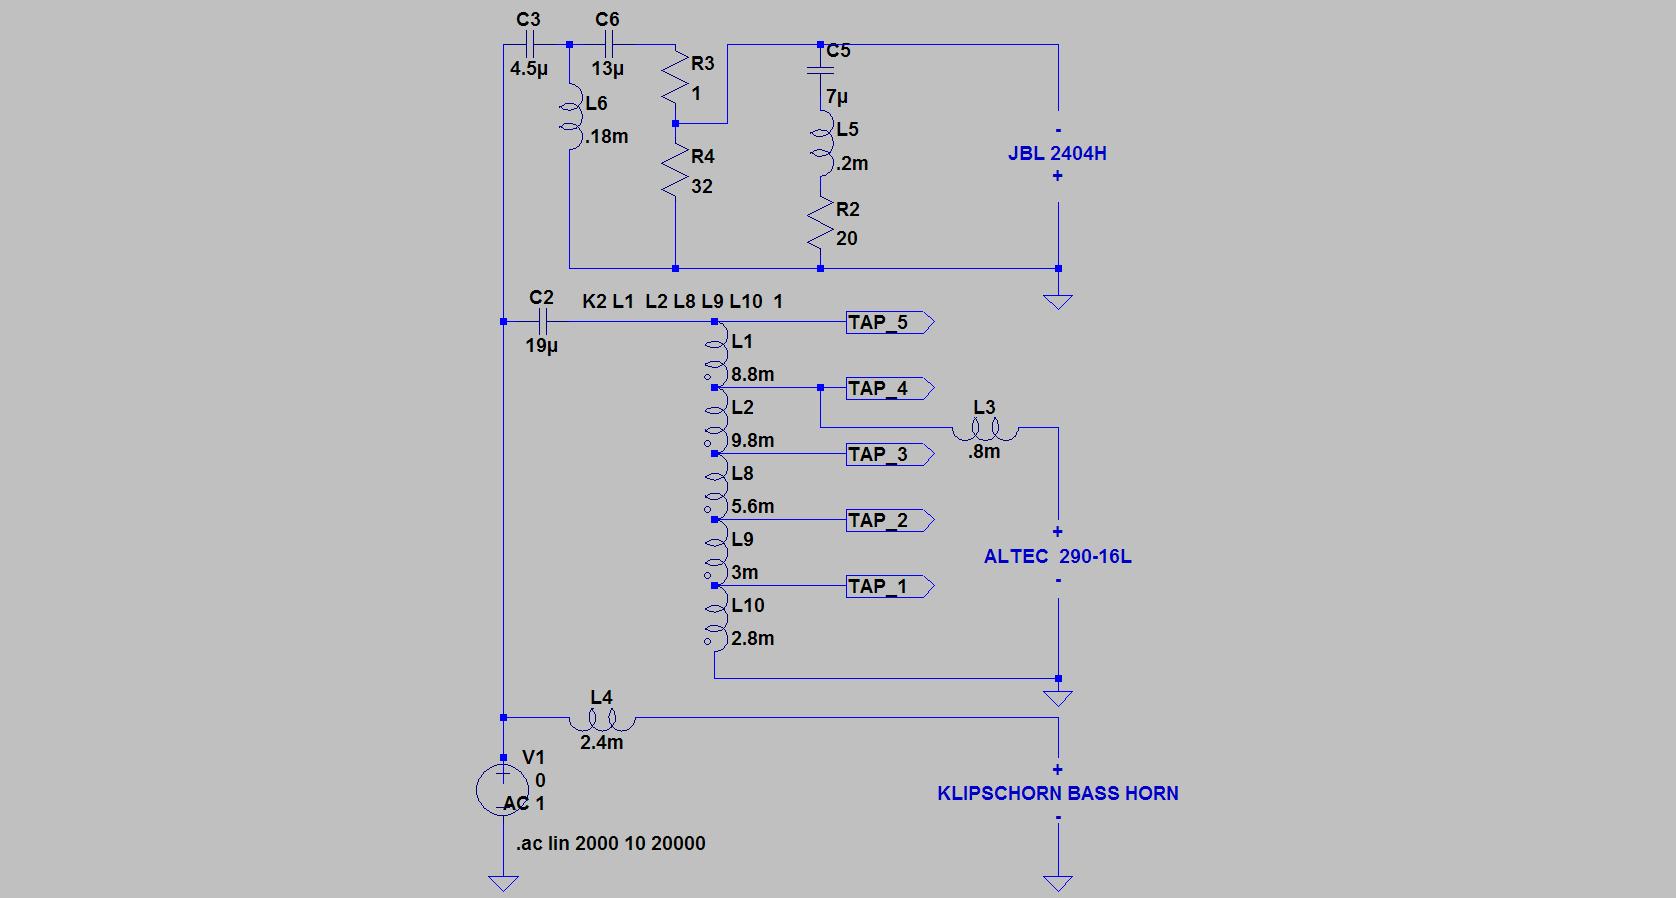 alk engineering crossover schematics szukaj w google diy horn alk engineering crossover schematics szukaj w google